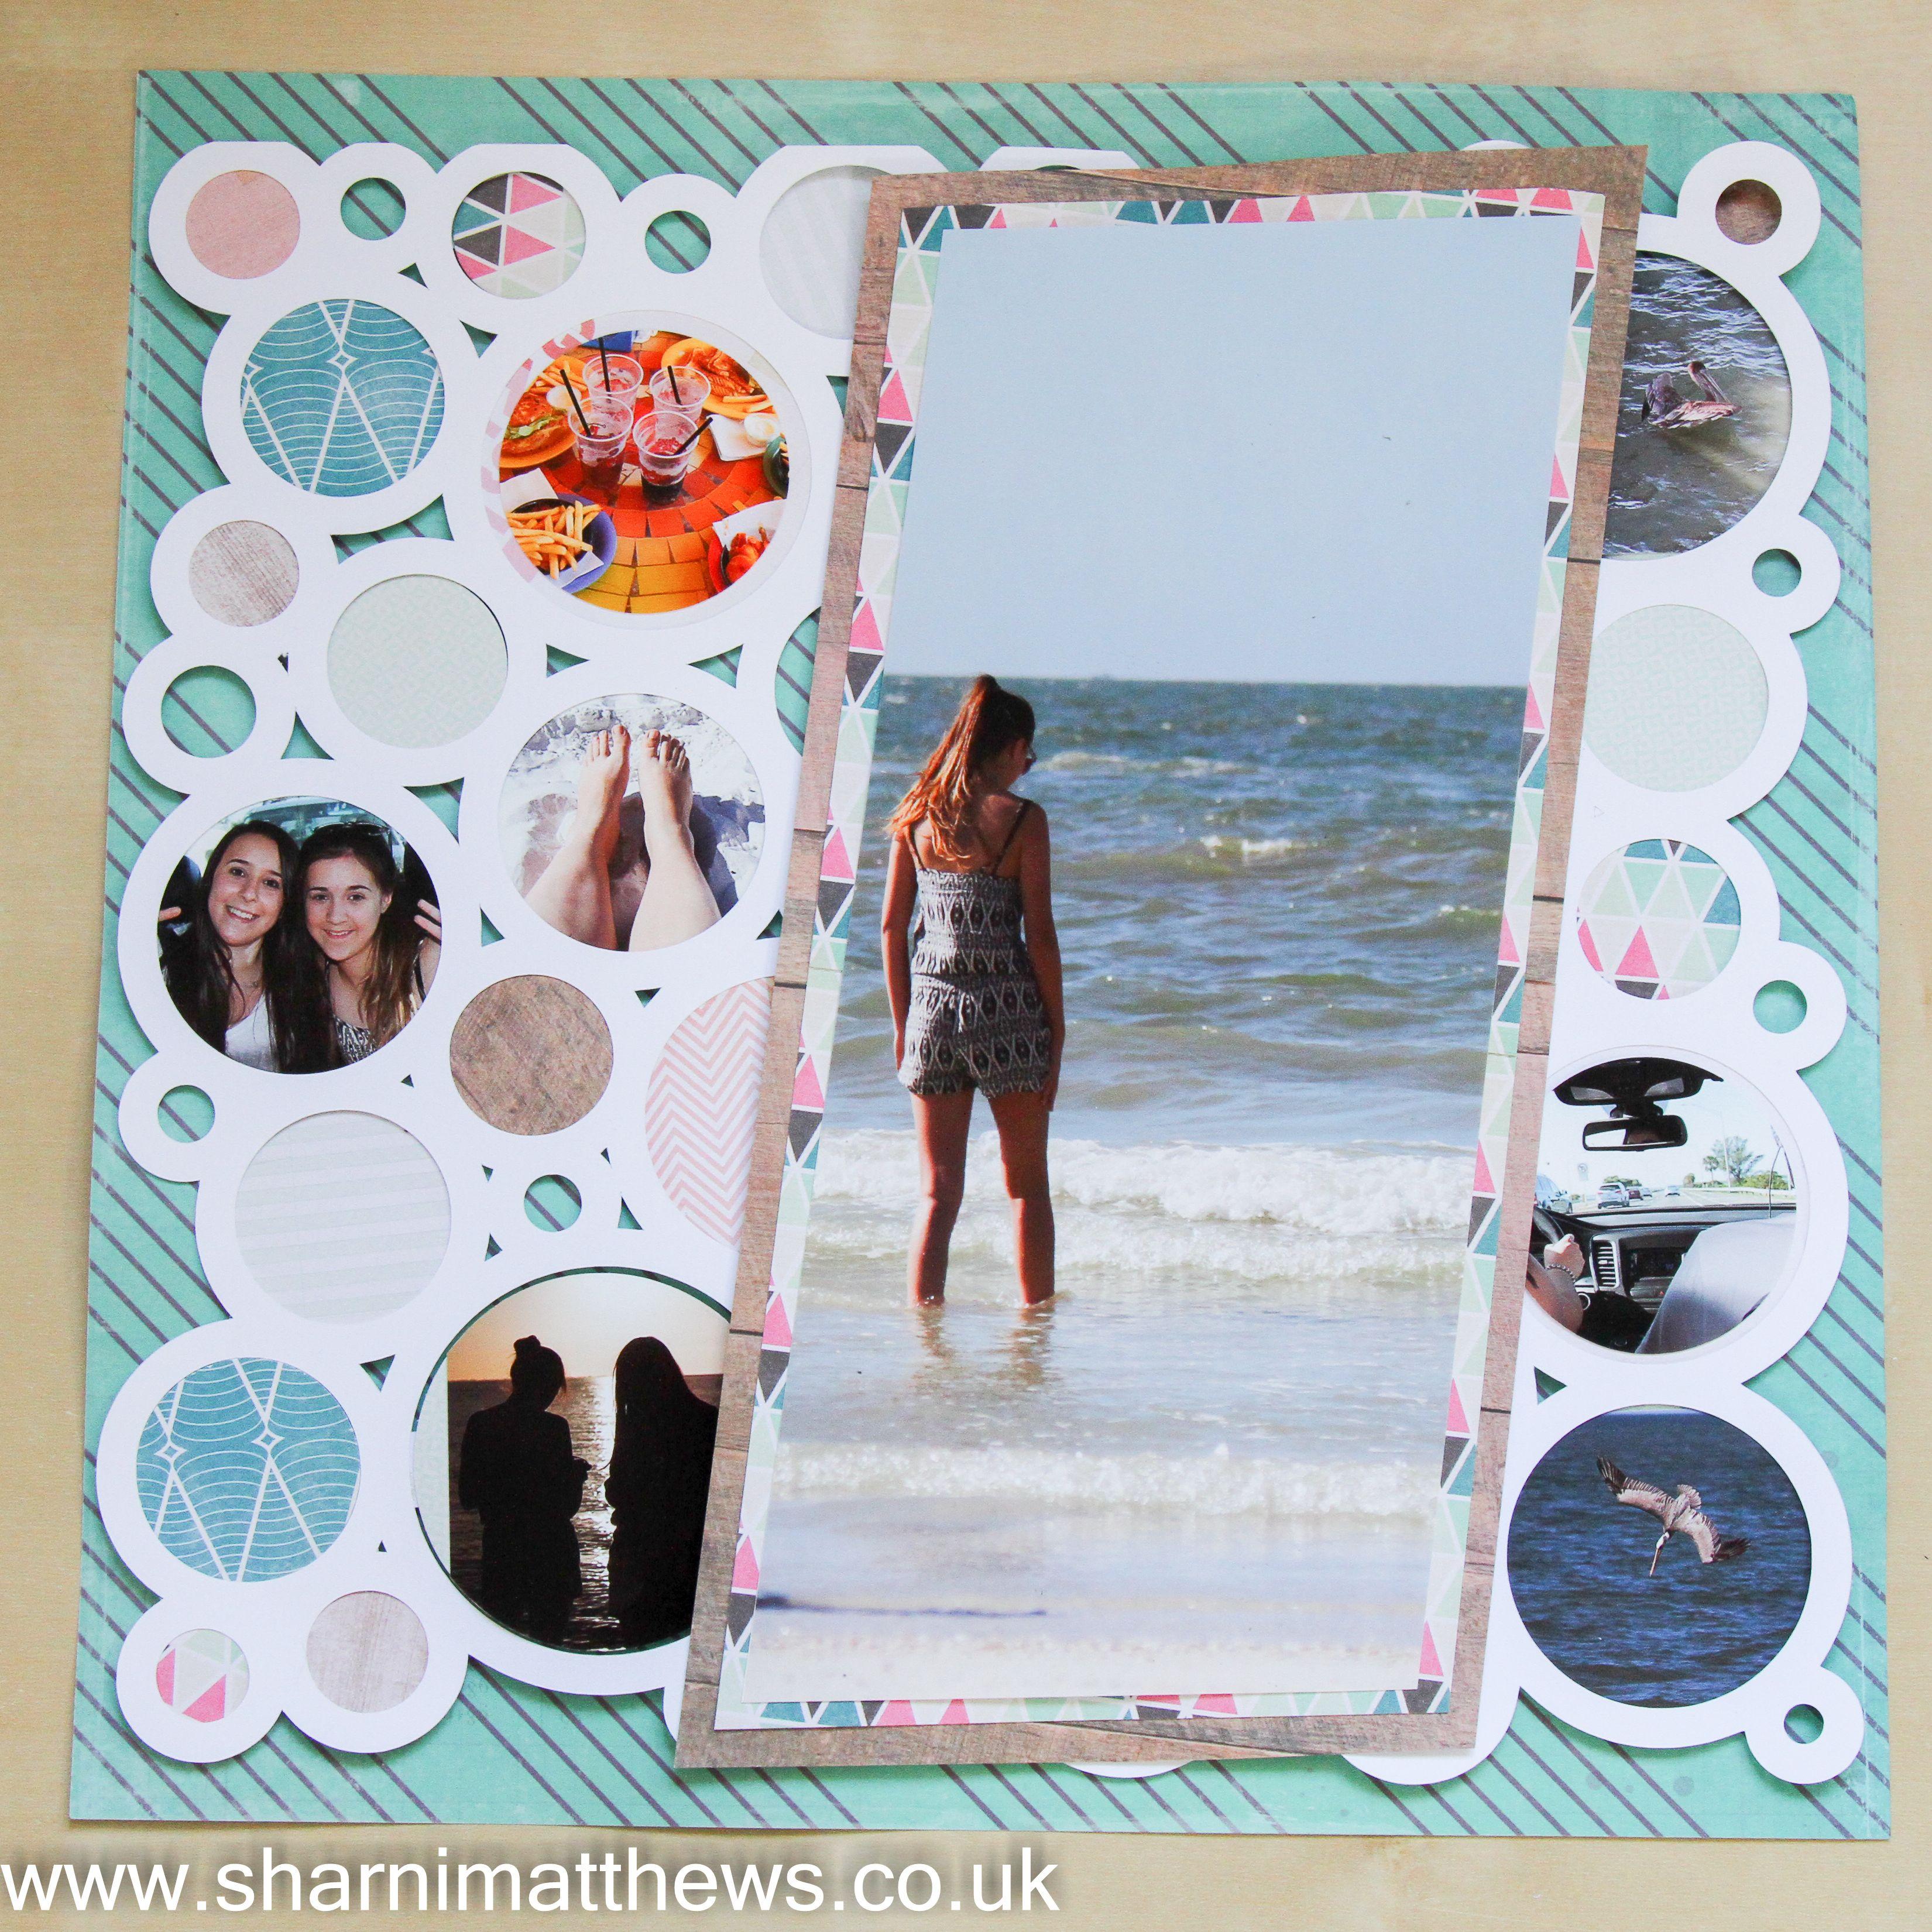 How to scrapbook uk - Scrapbook Layout Maggie Holmes Confetti Clear Water Www Sharnimatthews Co